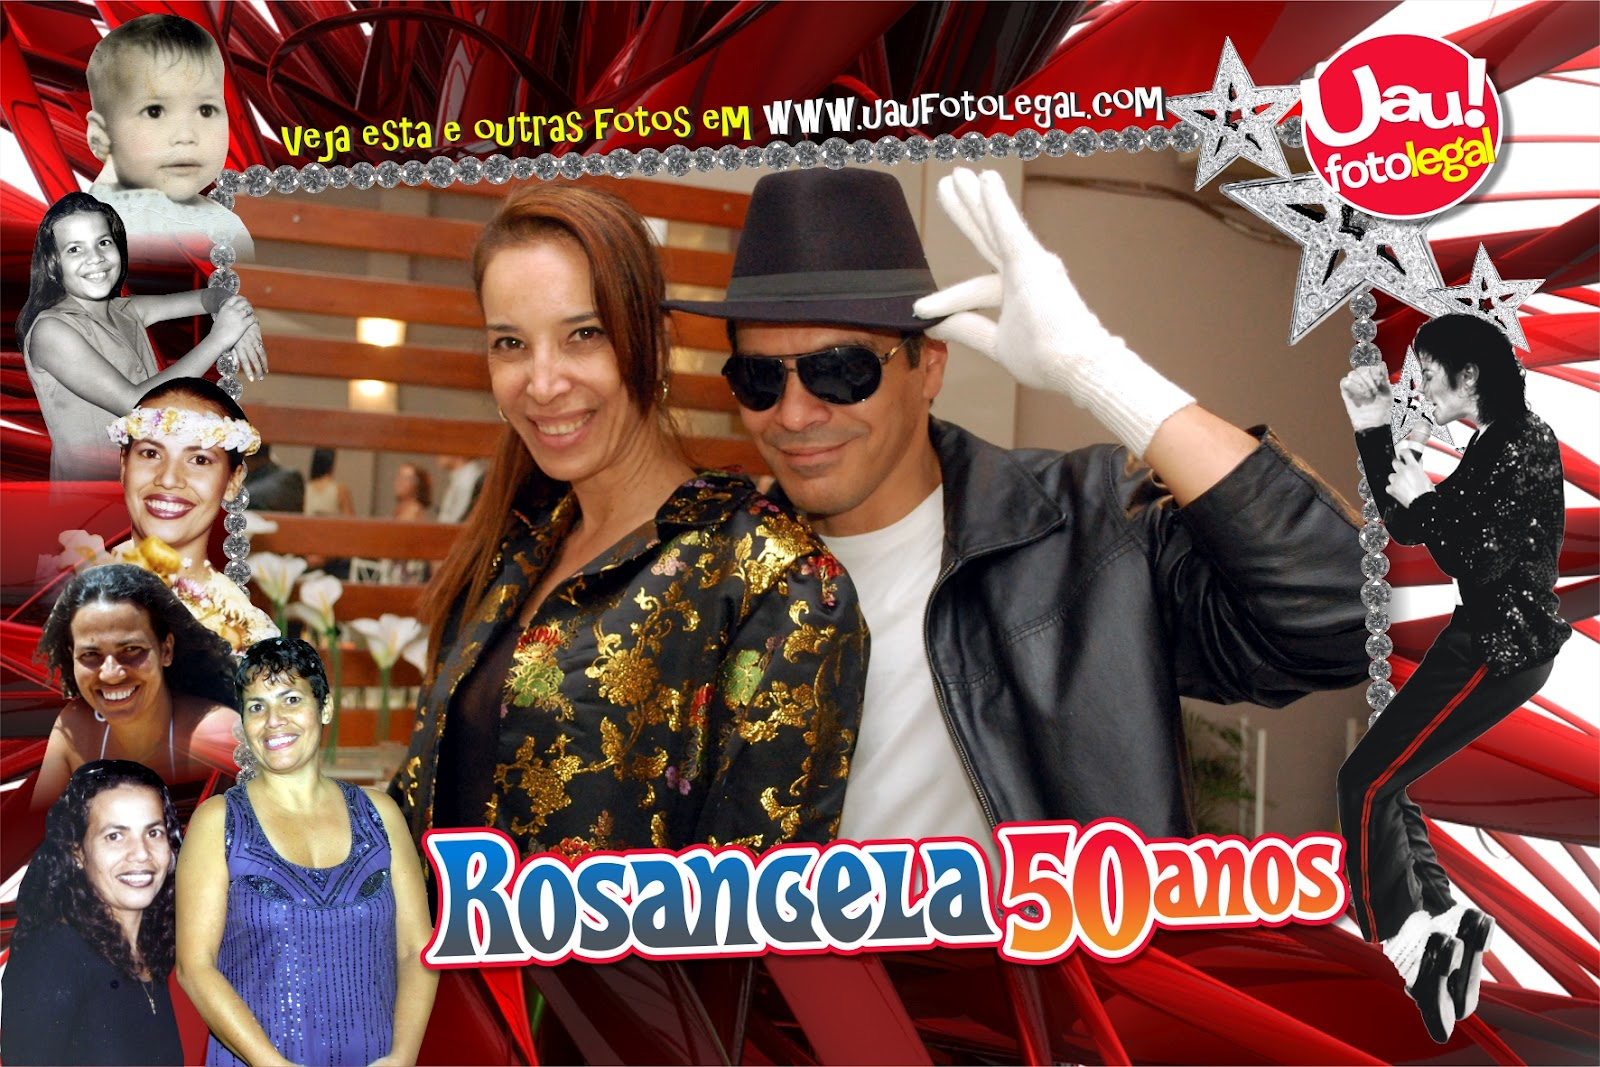 http://4.bp.blogspot.com/-7YqIOgYoWVQ/UDGKCRkaBcI/AAAAAAAAF48/2rONOyZmhYg/s1600/Uau+Foto+Legal+50+anos+Rosangela+Michael+Jackson_63.jpg